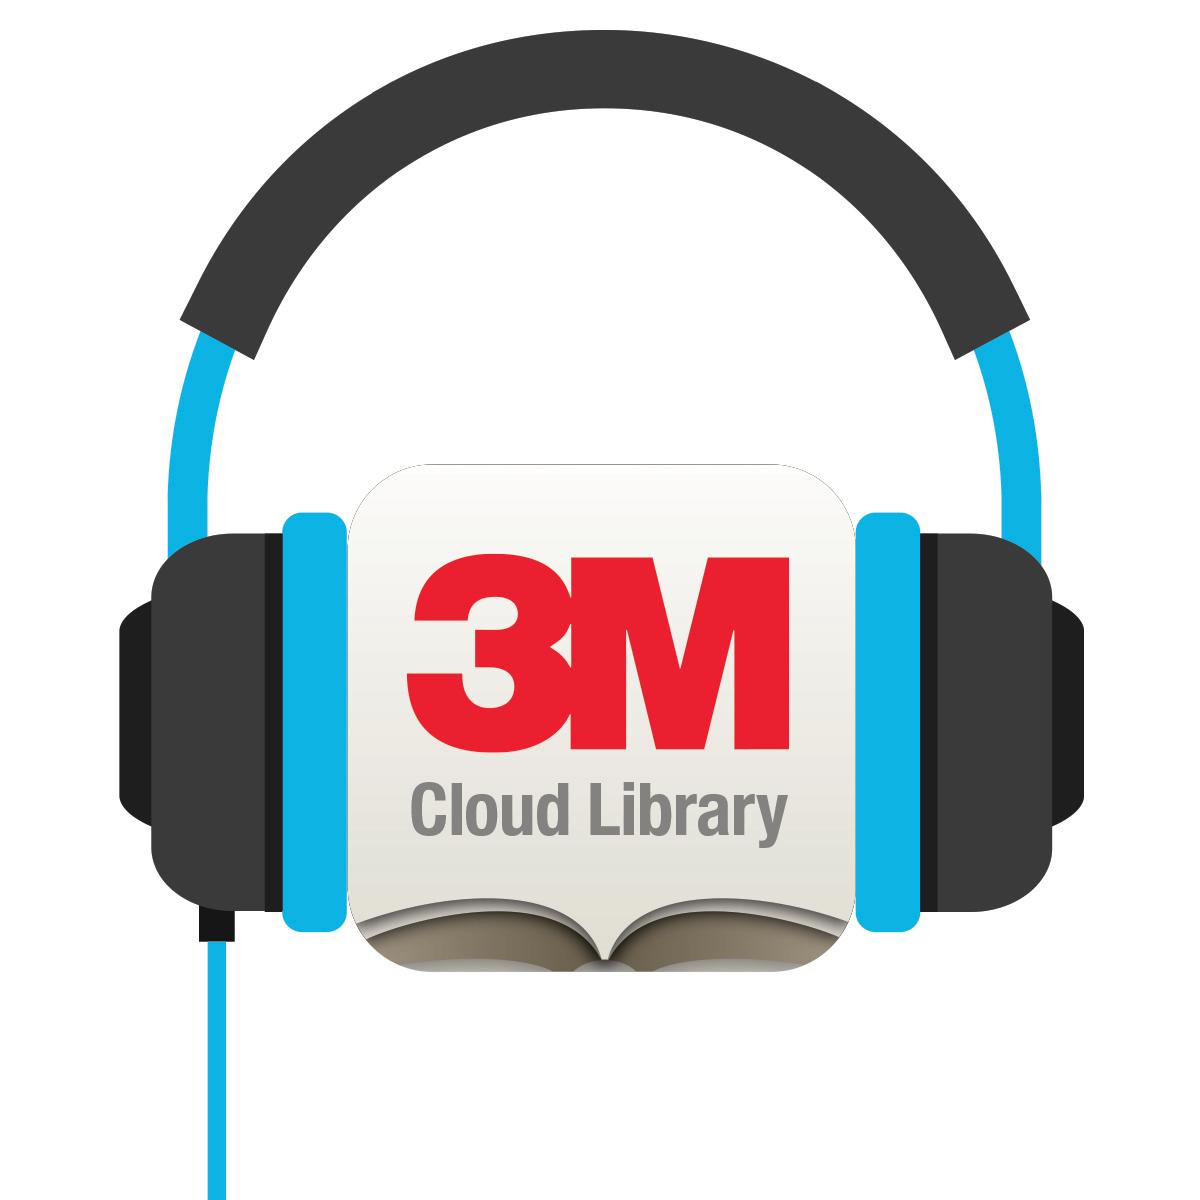 3m cloud library app download